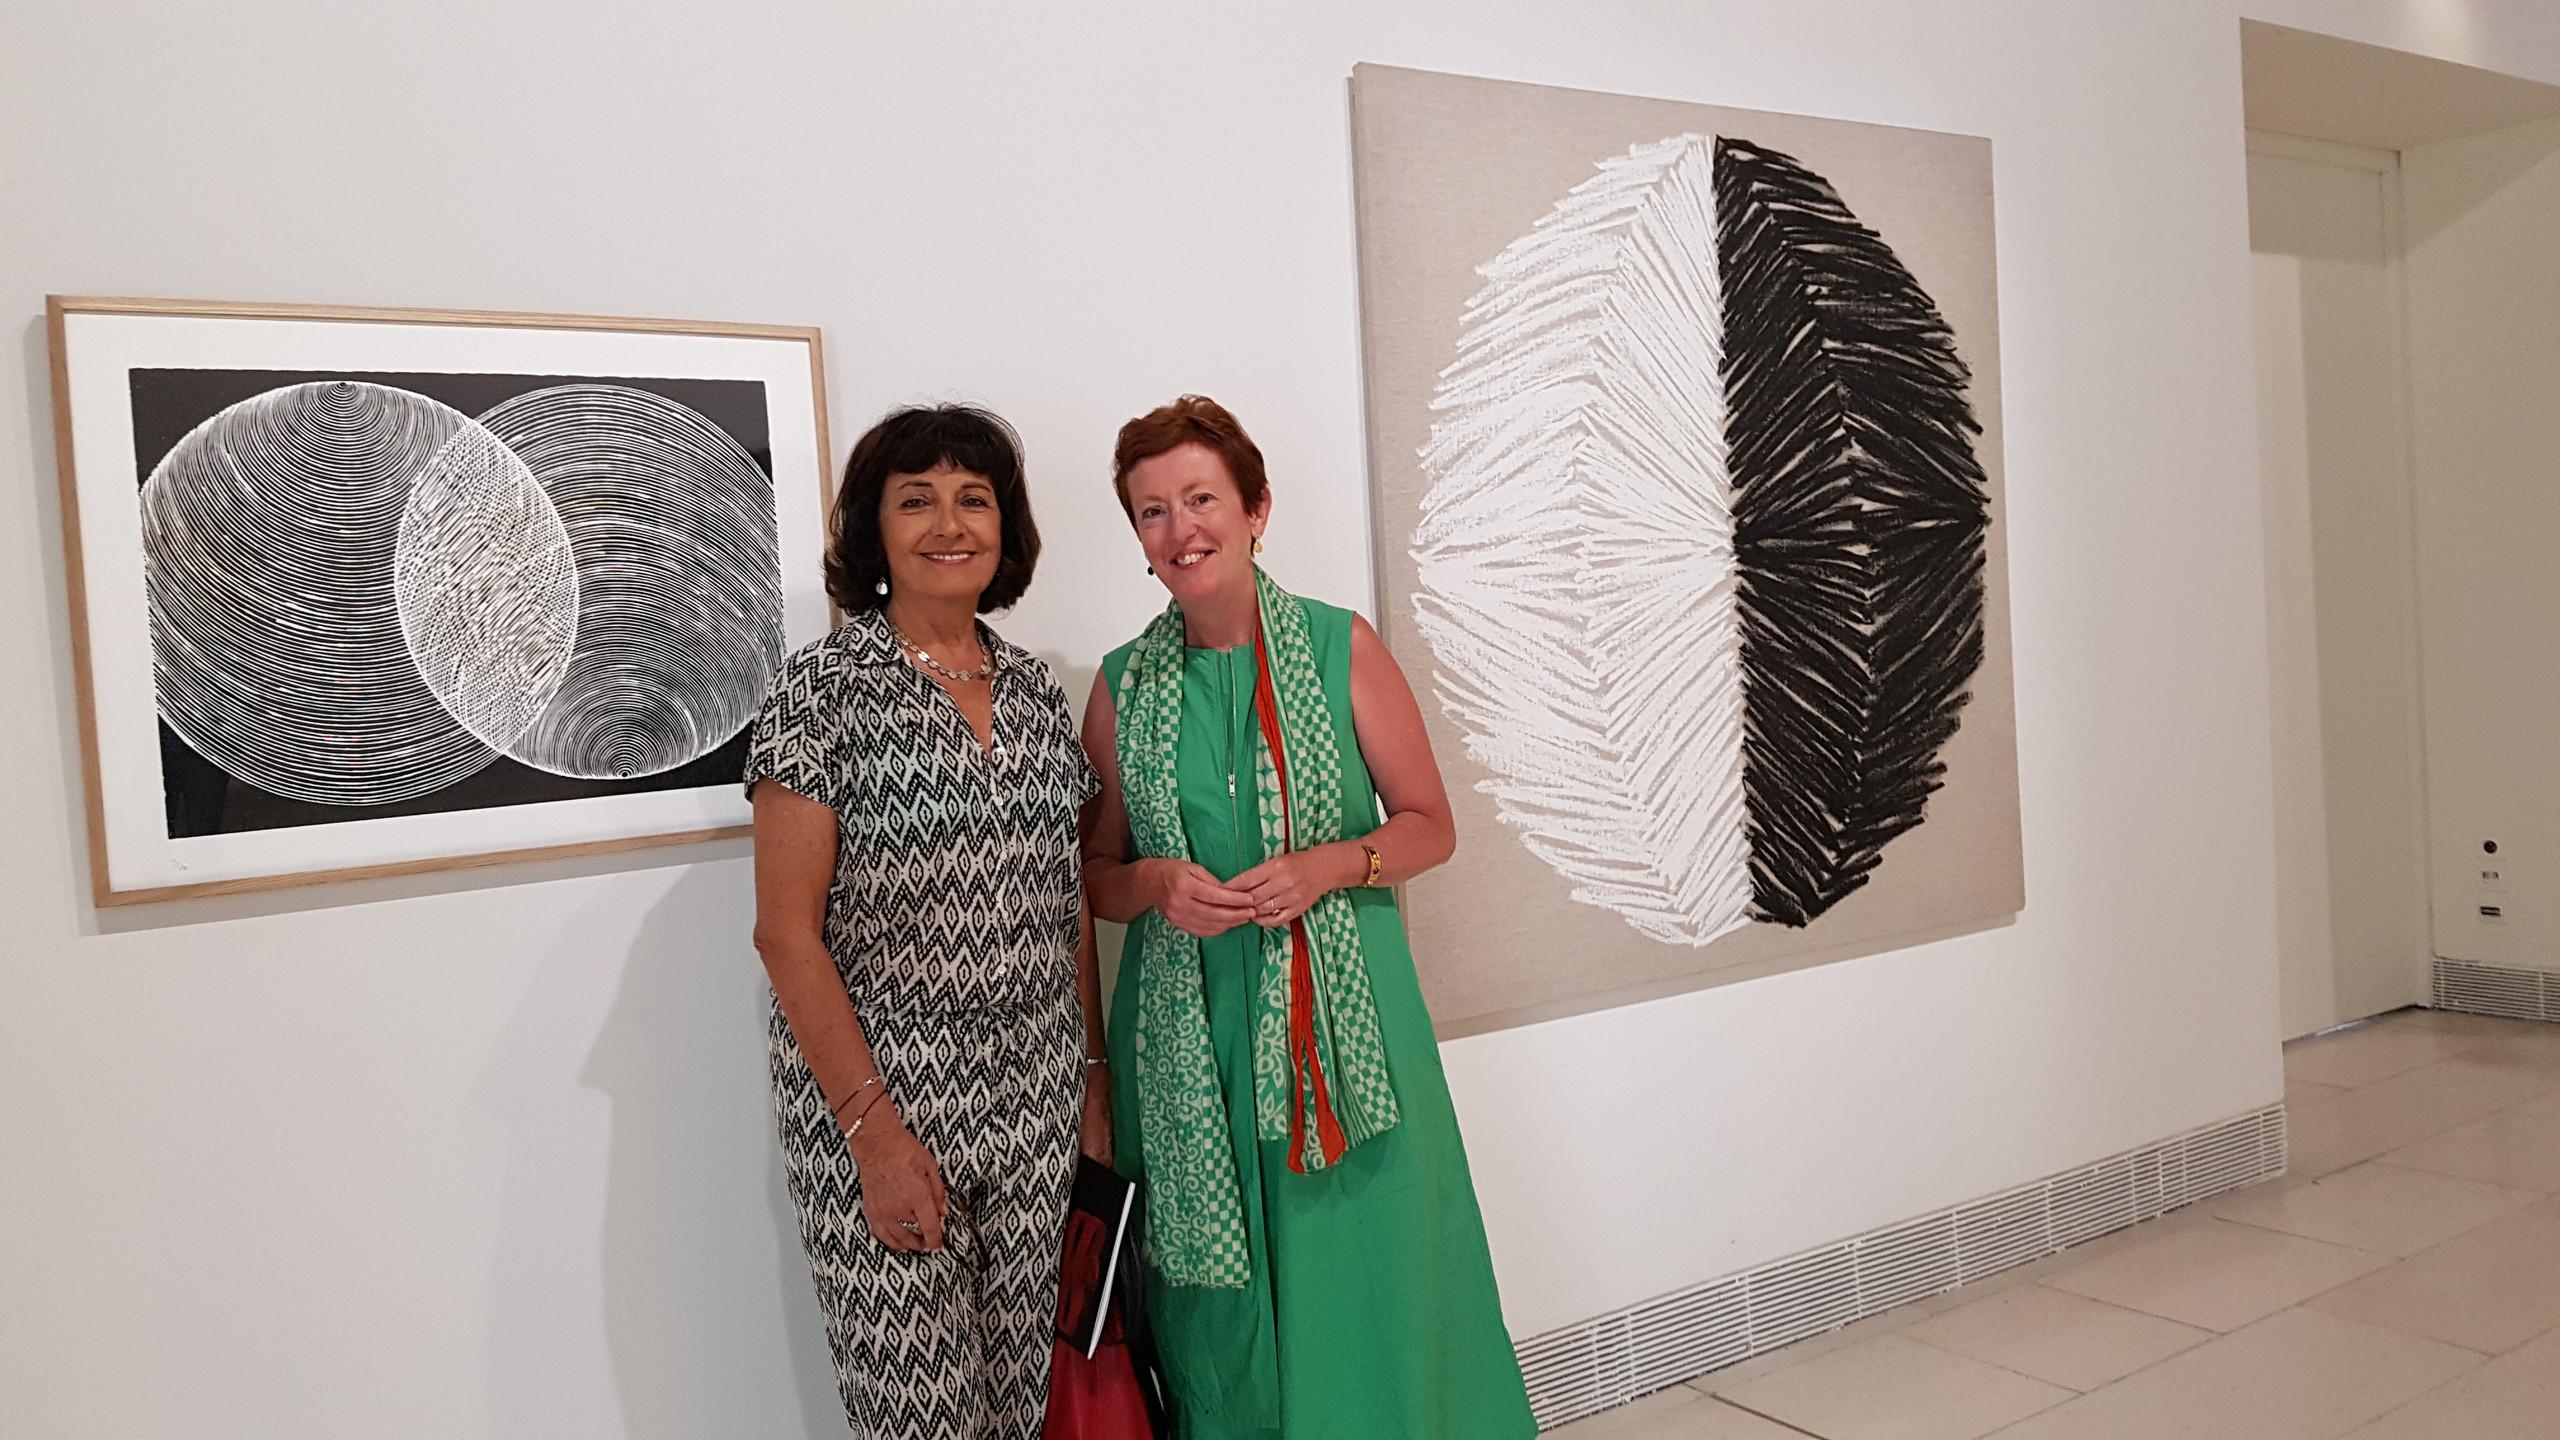 Najia Mehadji et Nathalie Gallissot, commissaire de l'exposition